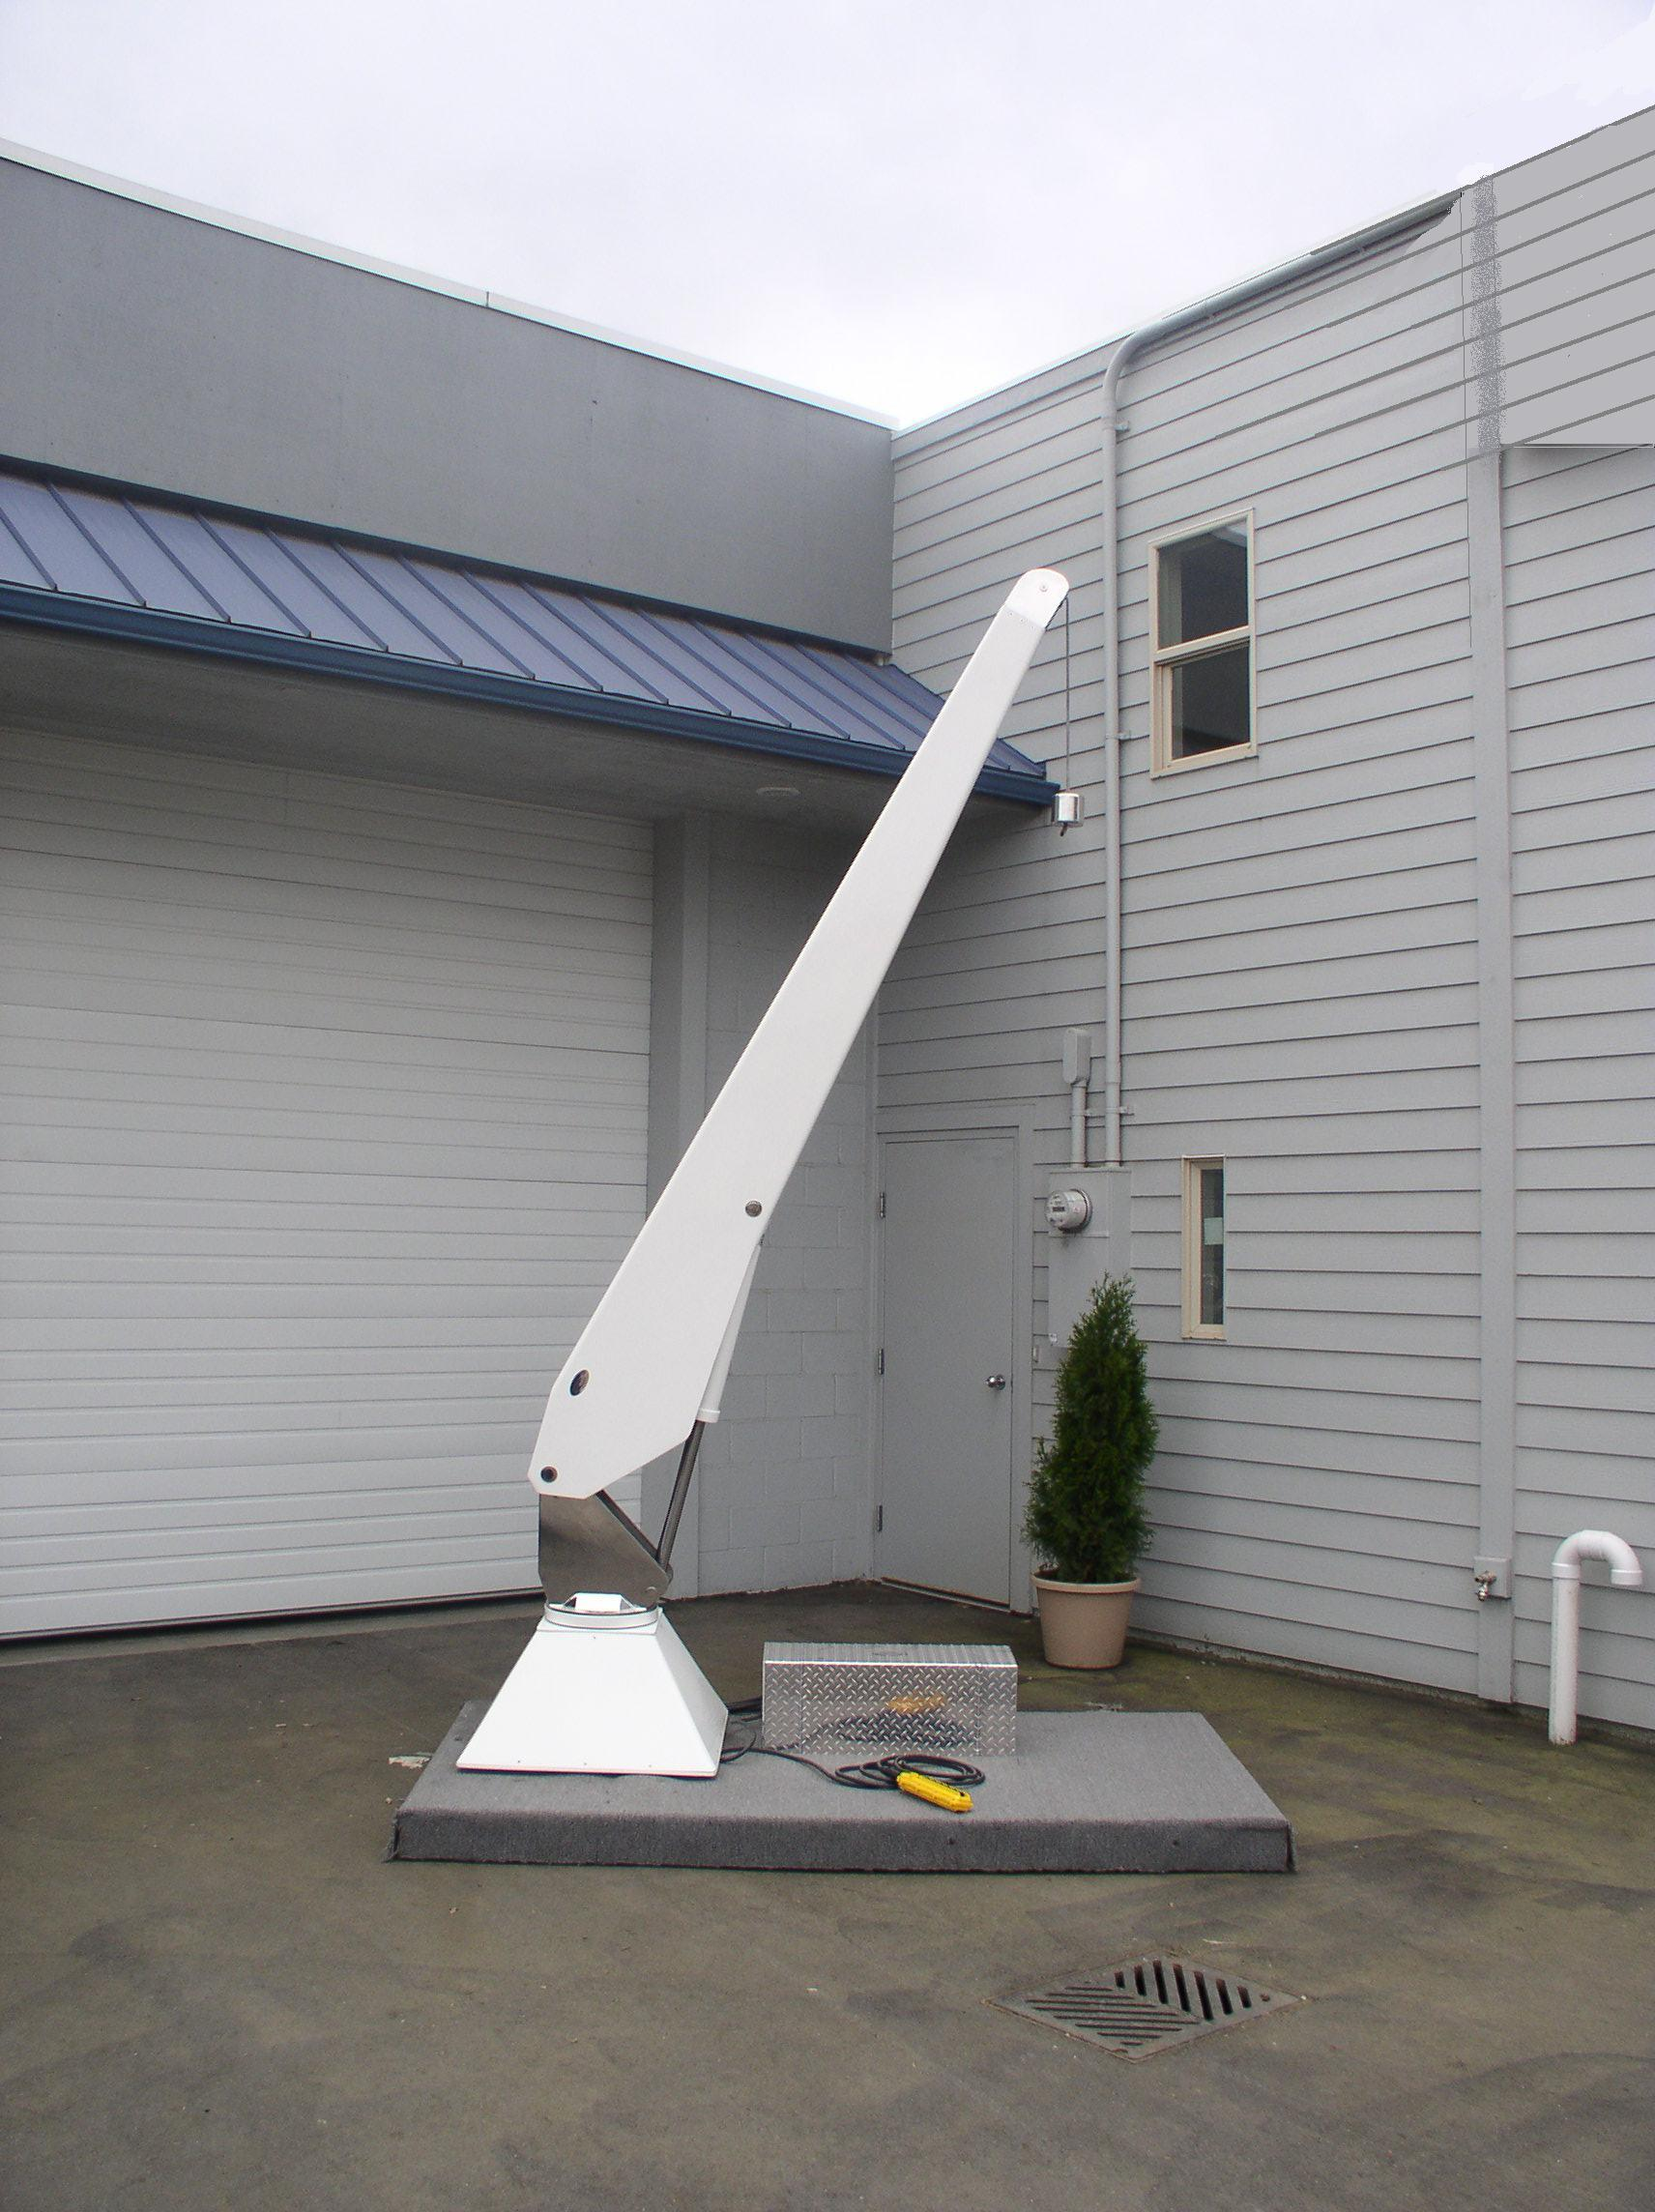 Olsson Mfg Crane Davits The RC 8 Cannon